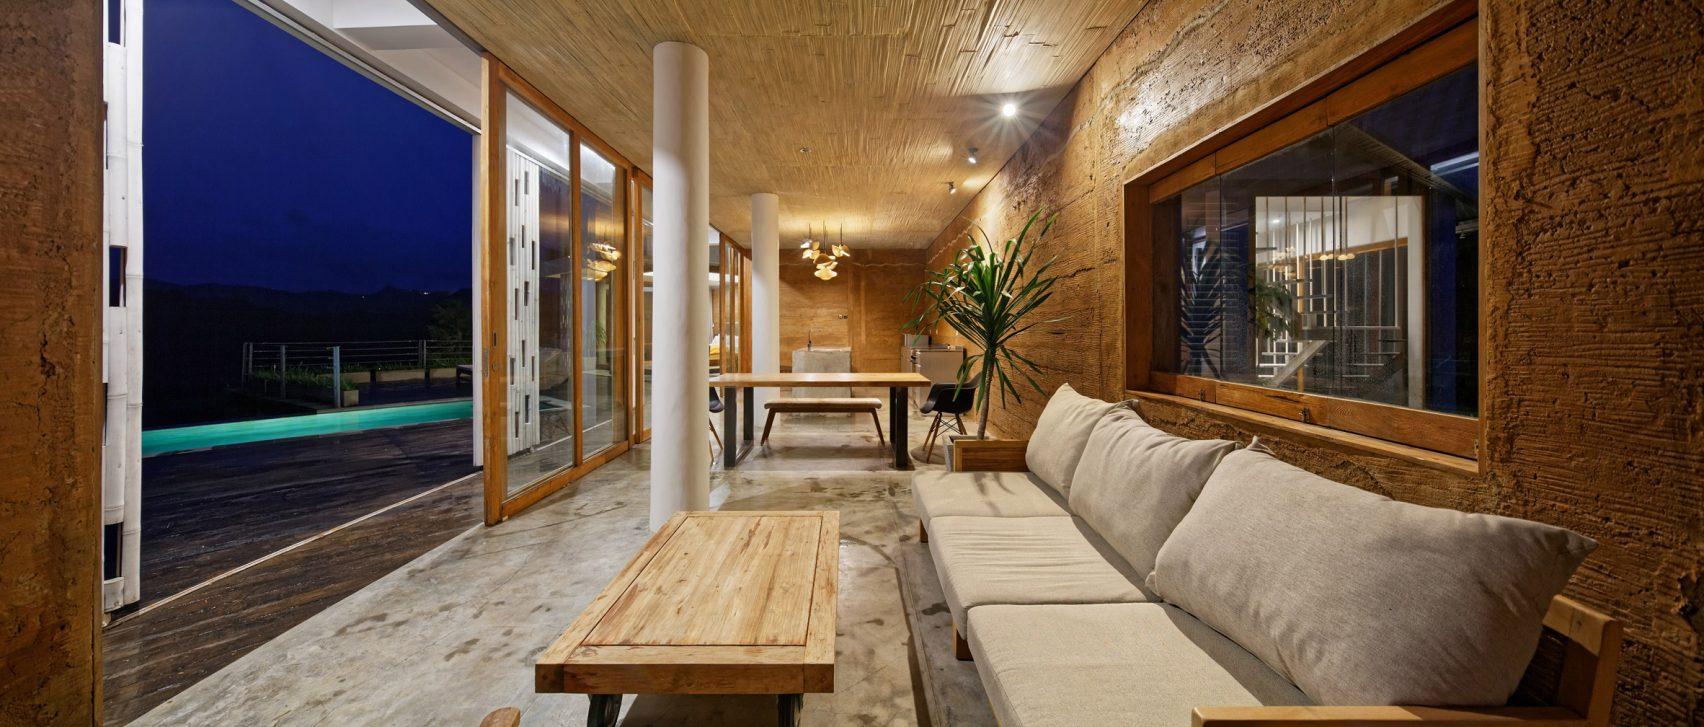 clay-house-budi-pradono-architects-architecture_dezeen_2364_col_3-1704x727.jpg